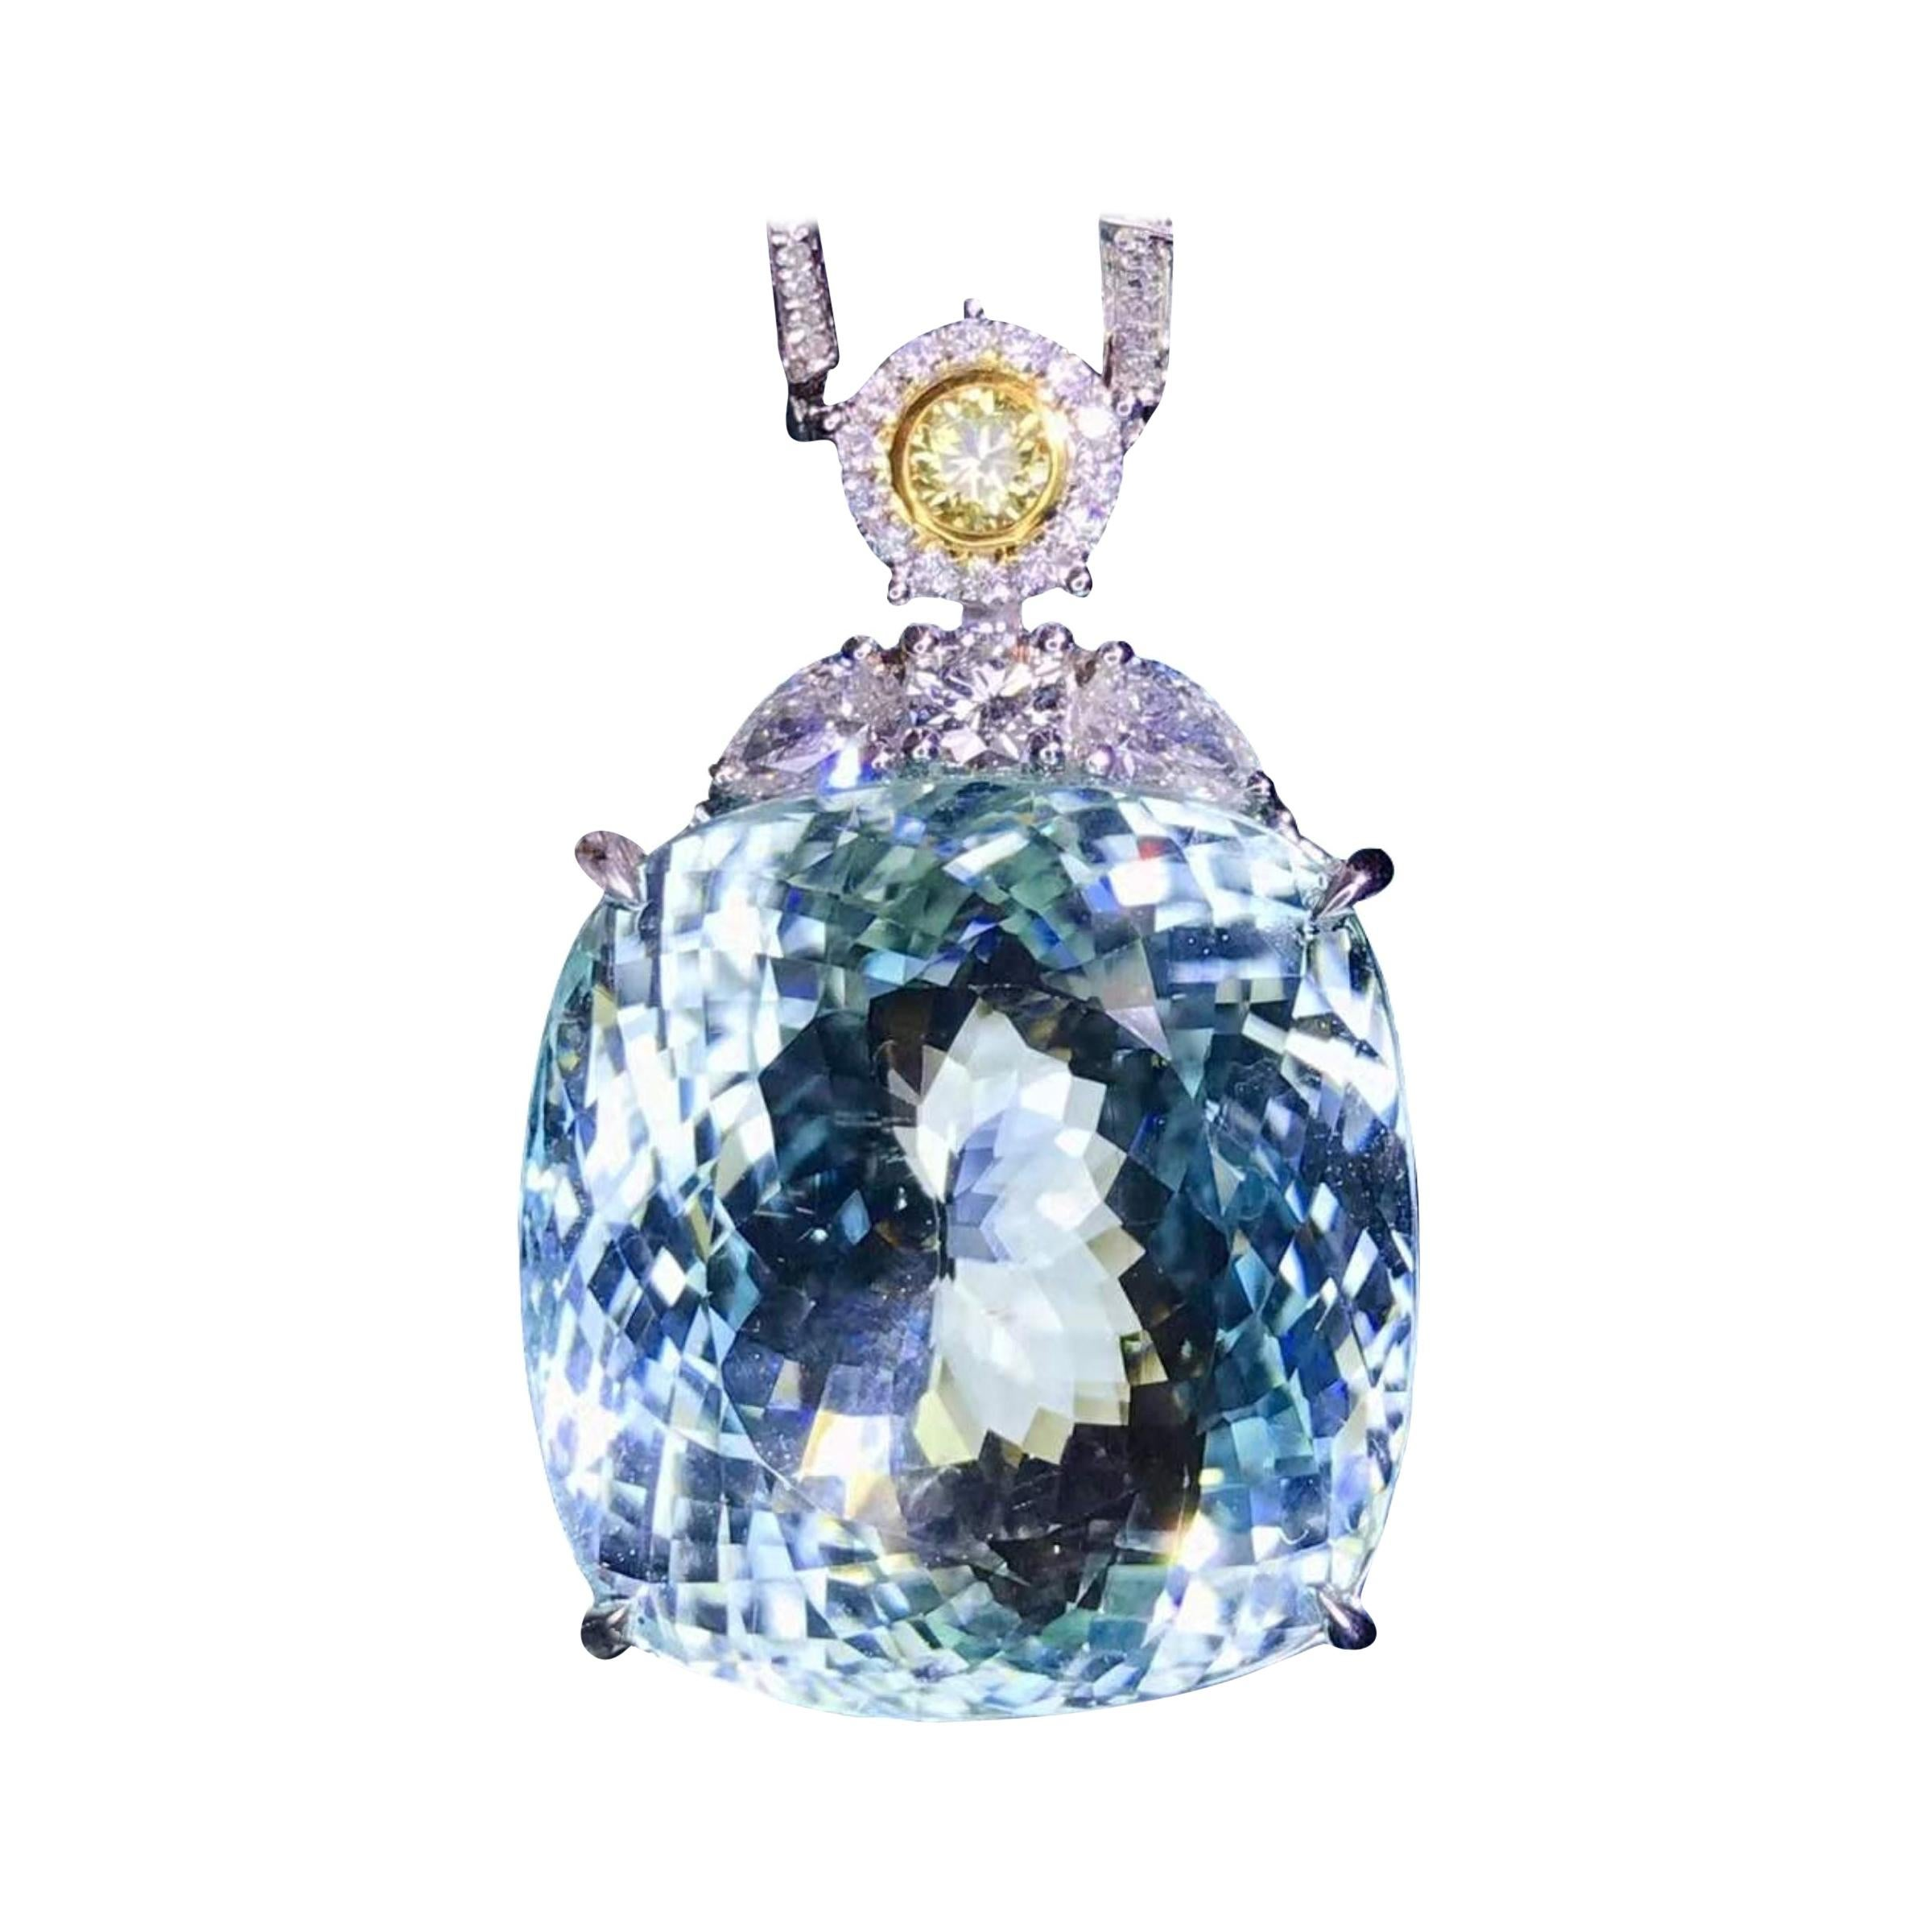 Paraiba Tourmaline Diamond Necklace 18k White Gold